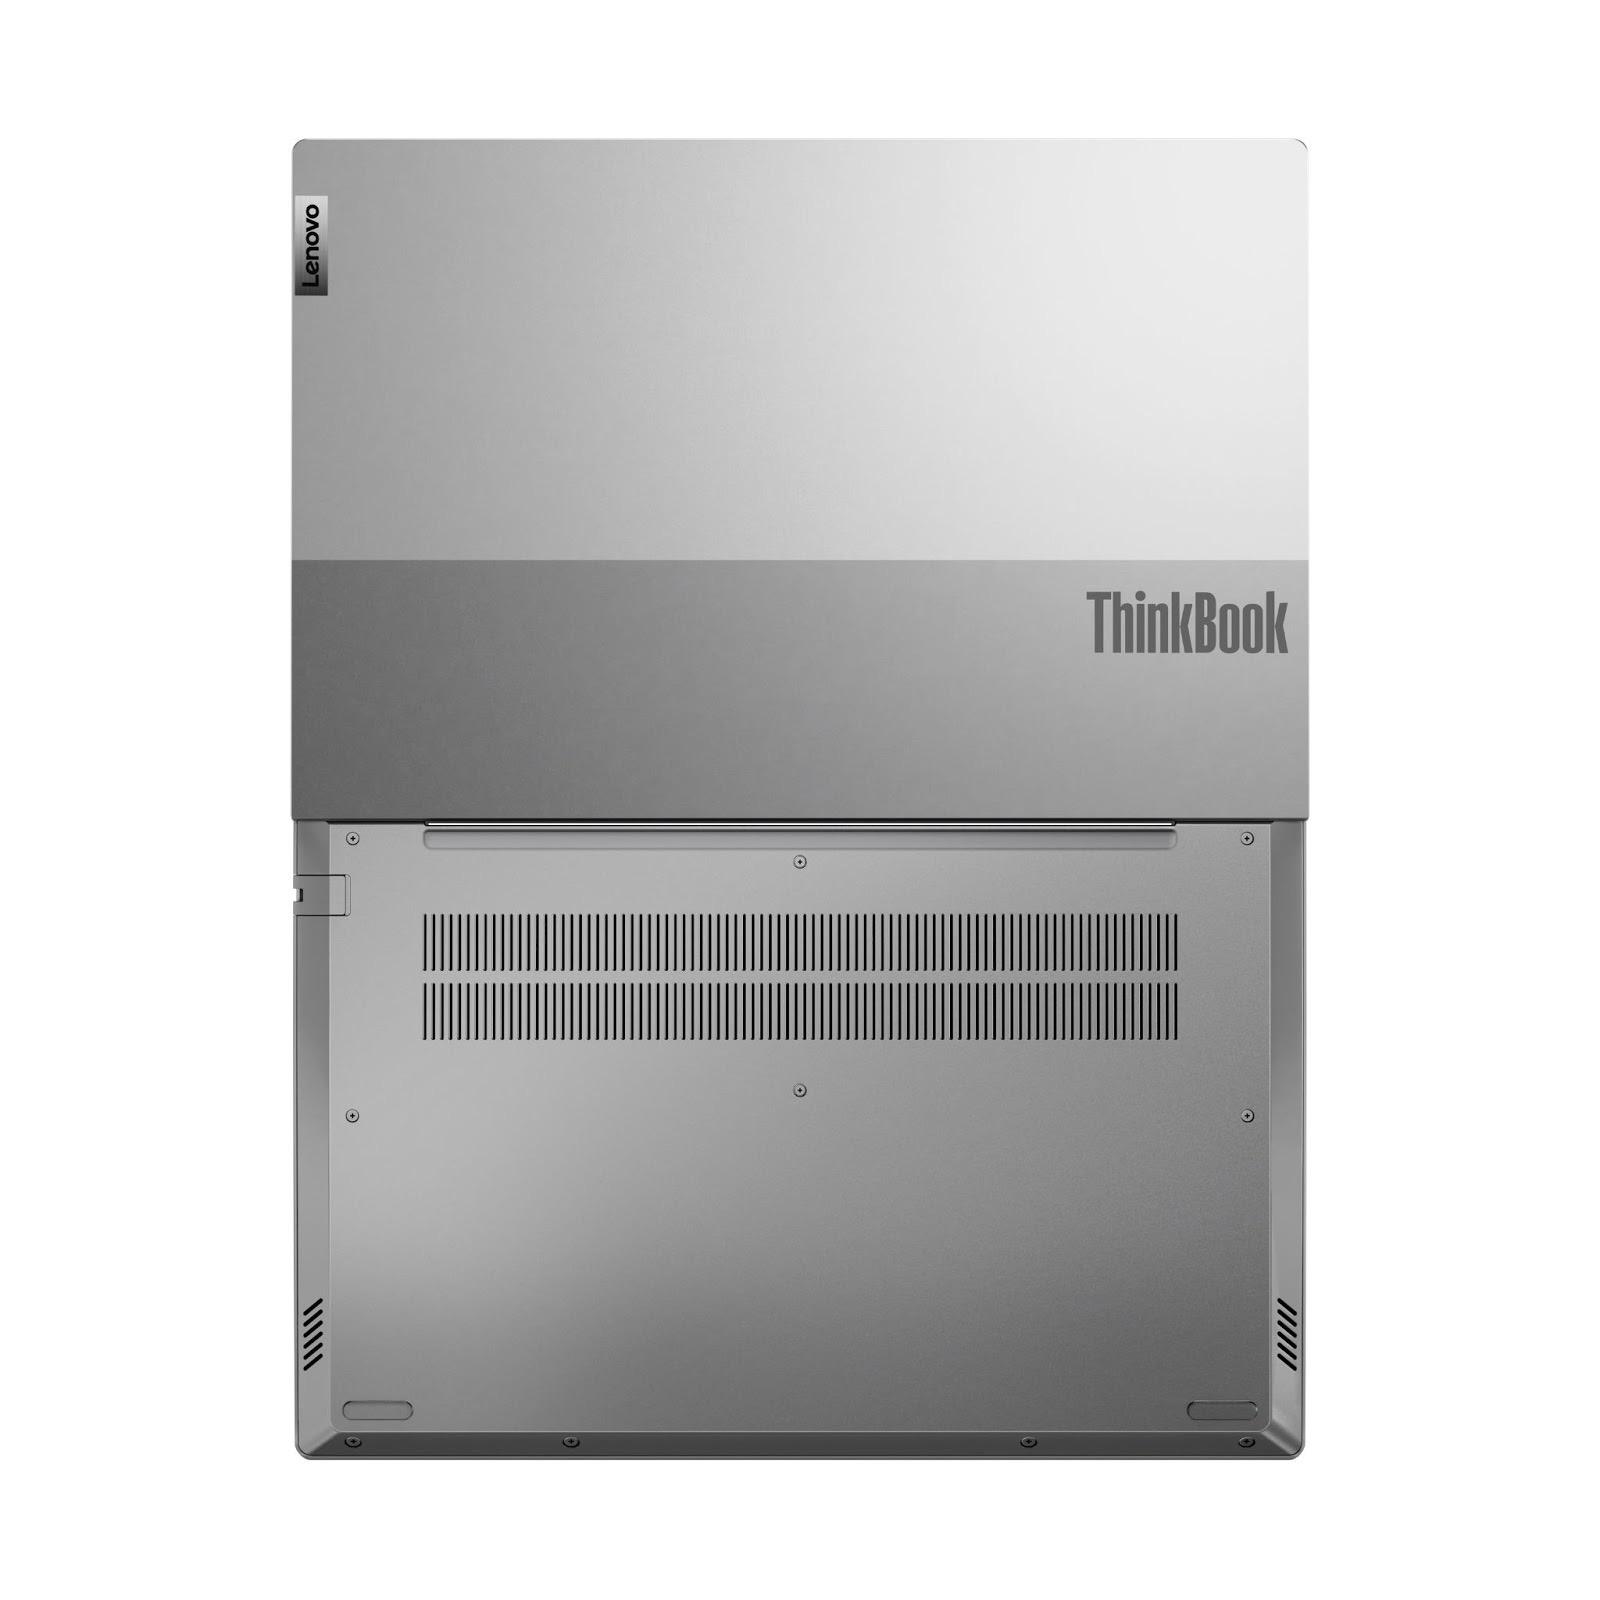 Фото 4. Ноутбук Lenovo ThinkBook 14 Gen 2 ITL Mineral Grey (20VD00CNRU)